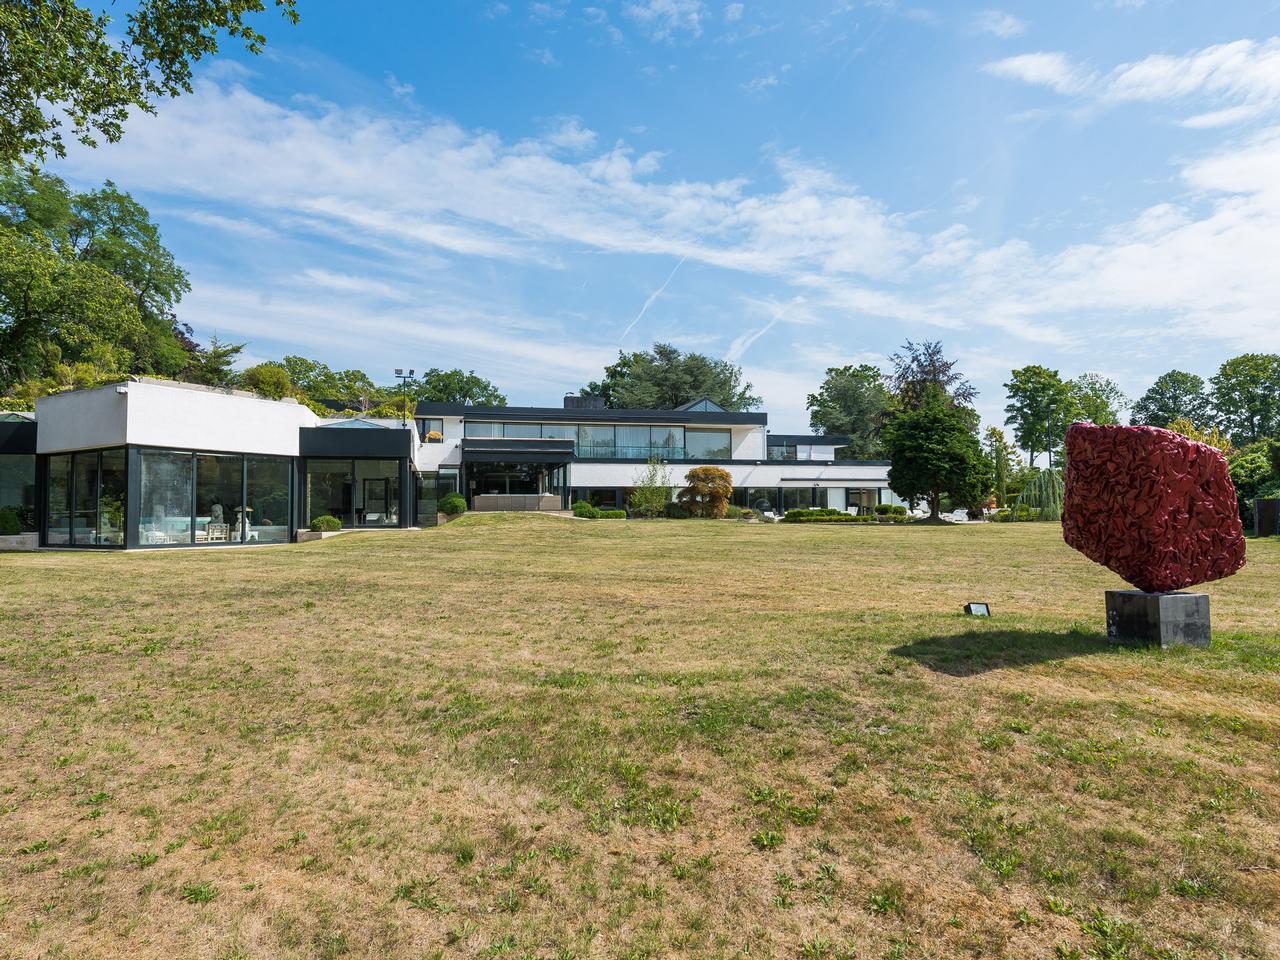 Other Residential for Sale at Wavre I Golf de la Bawette Wavre, Waloon Brabant, 1300 Belgium